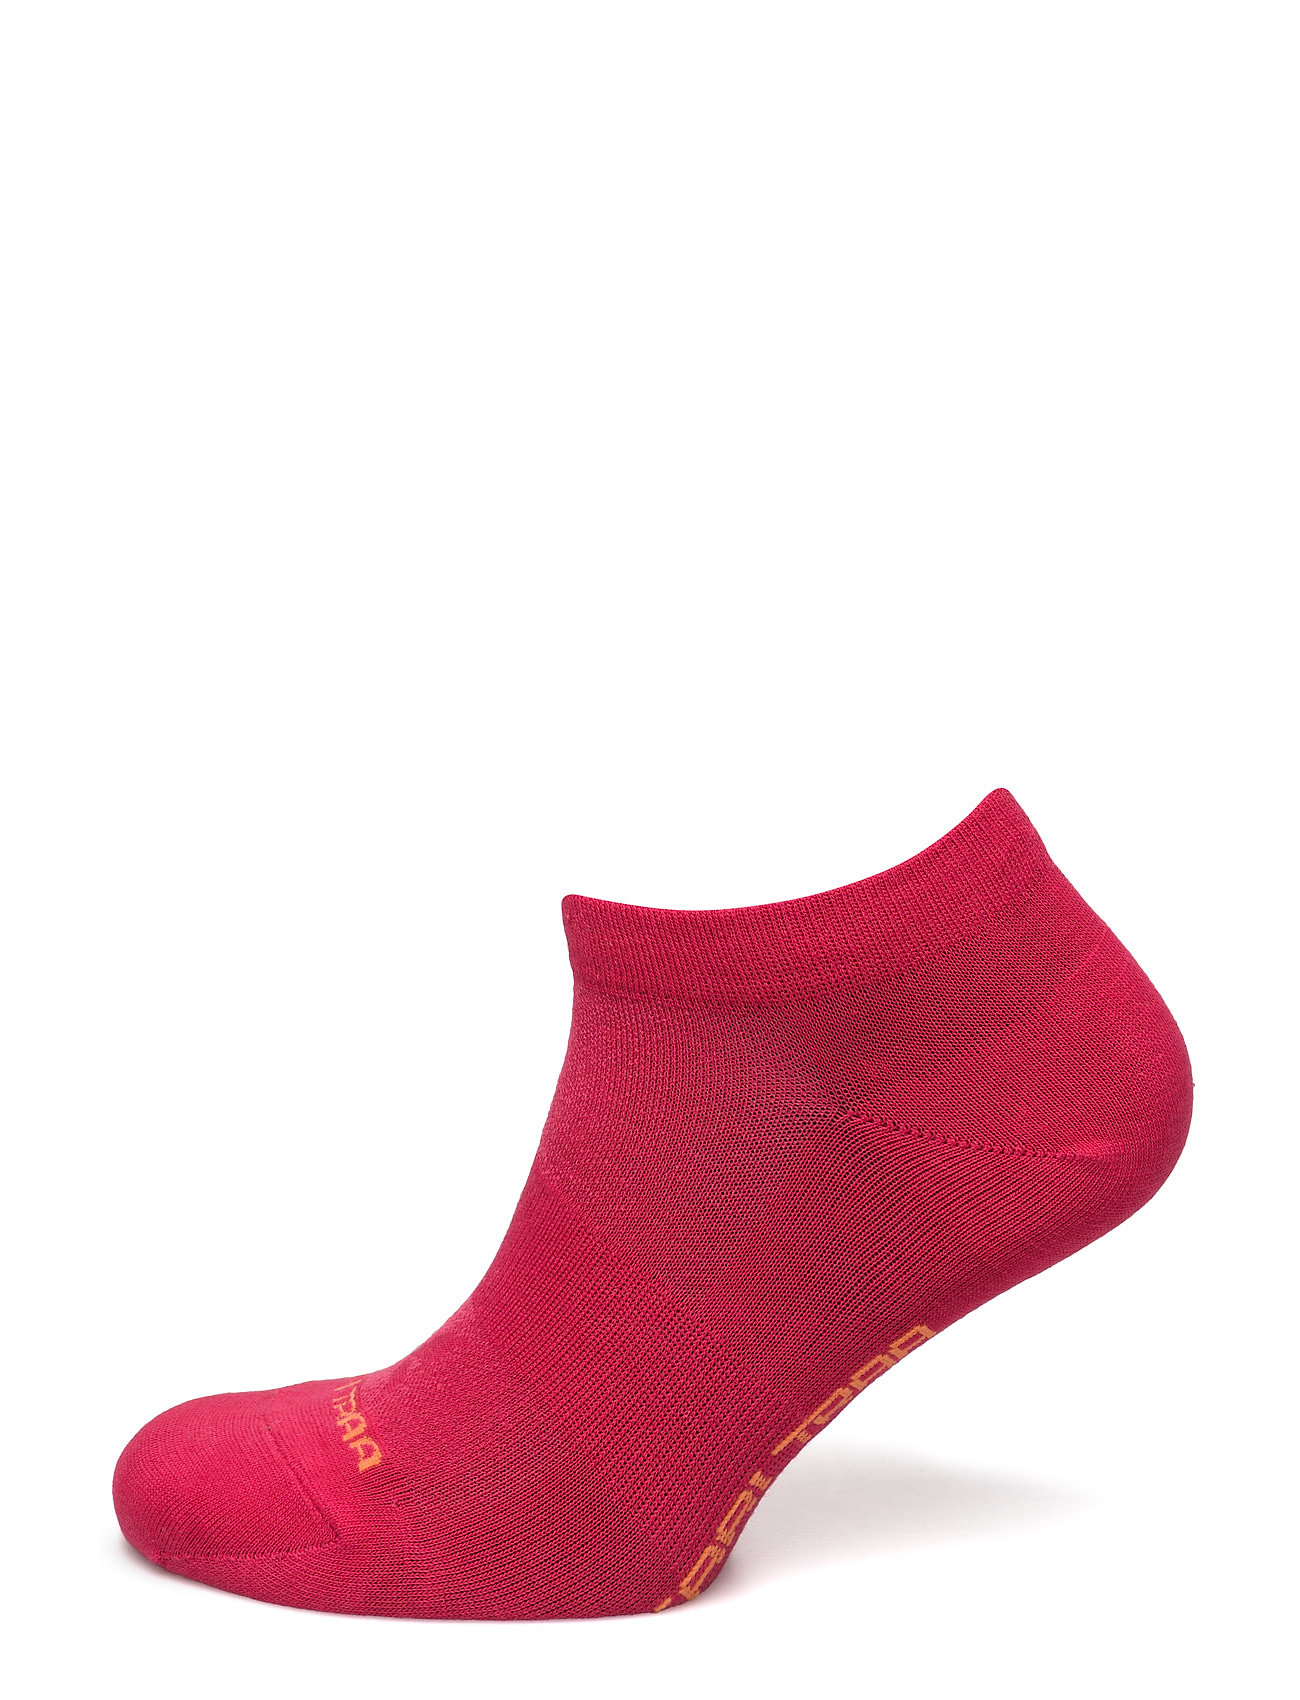 TÅFis Sock Kari Traa Sports undertøj til Damer i Rose